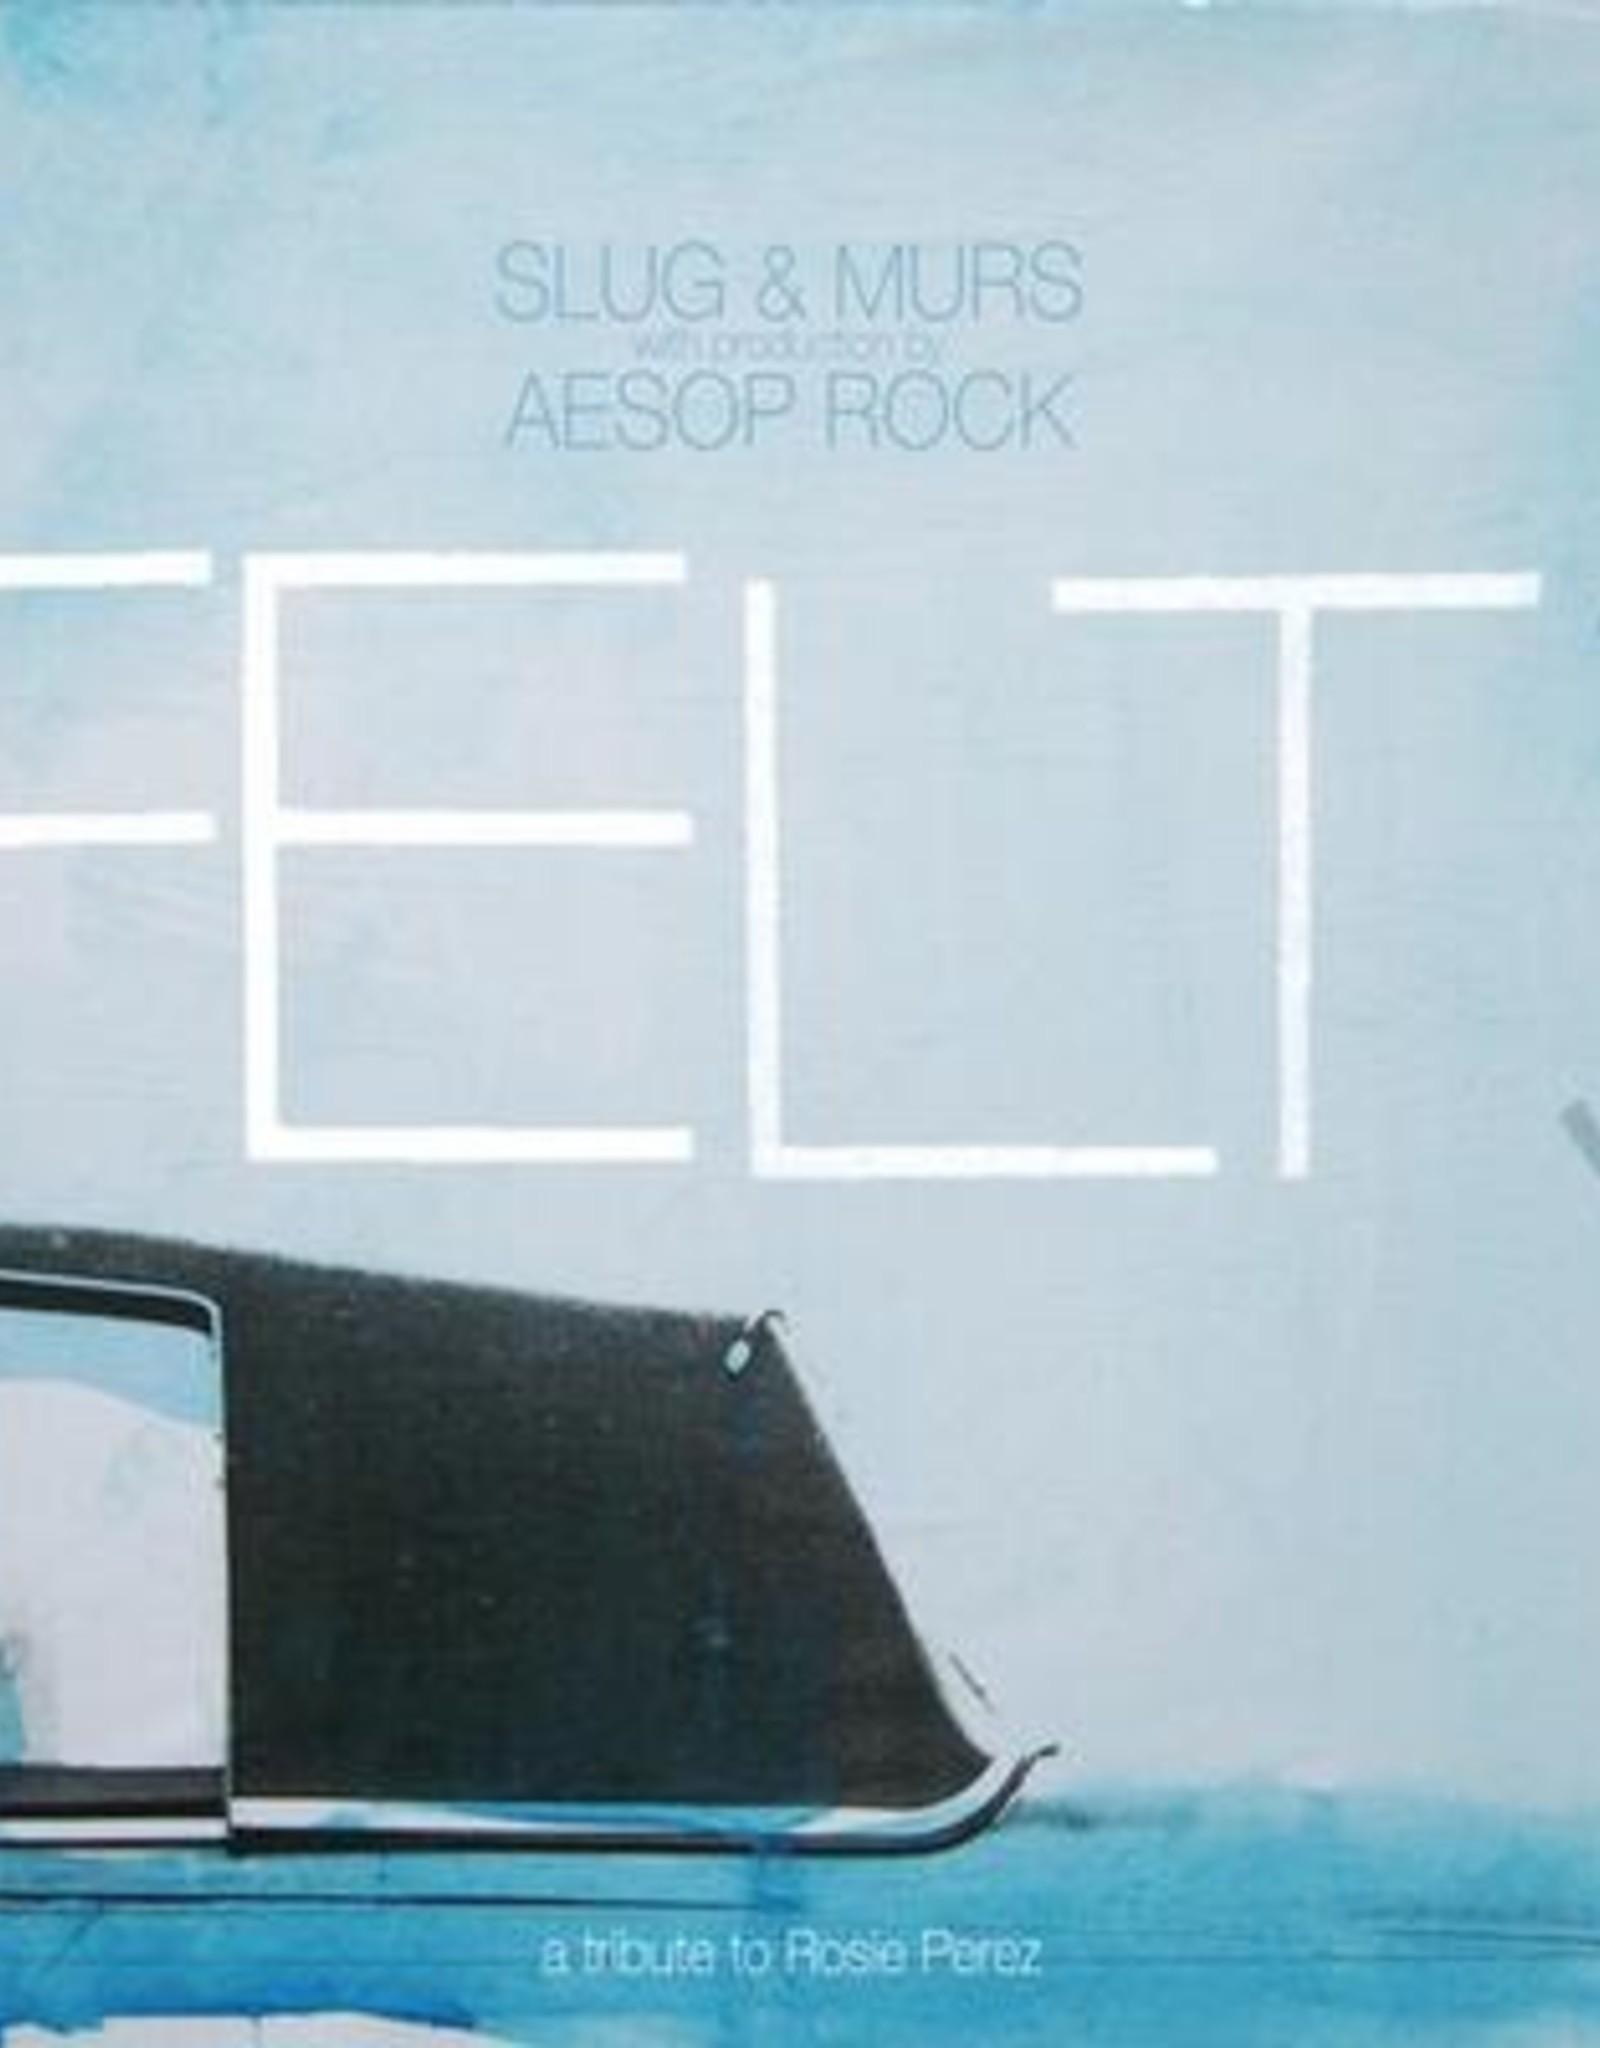 Felt - Felt 3: A Tribute To Rosie Perez (10 Year Anniversary Edition) (Blue & White Galaxy Effect 2x Vinyl LP)